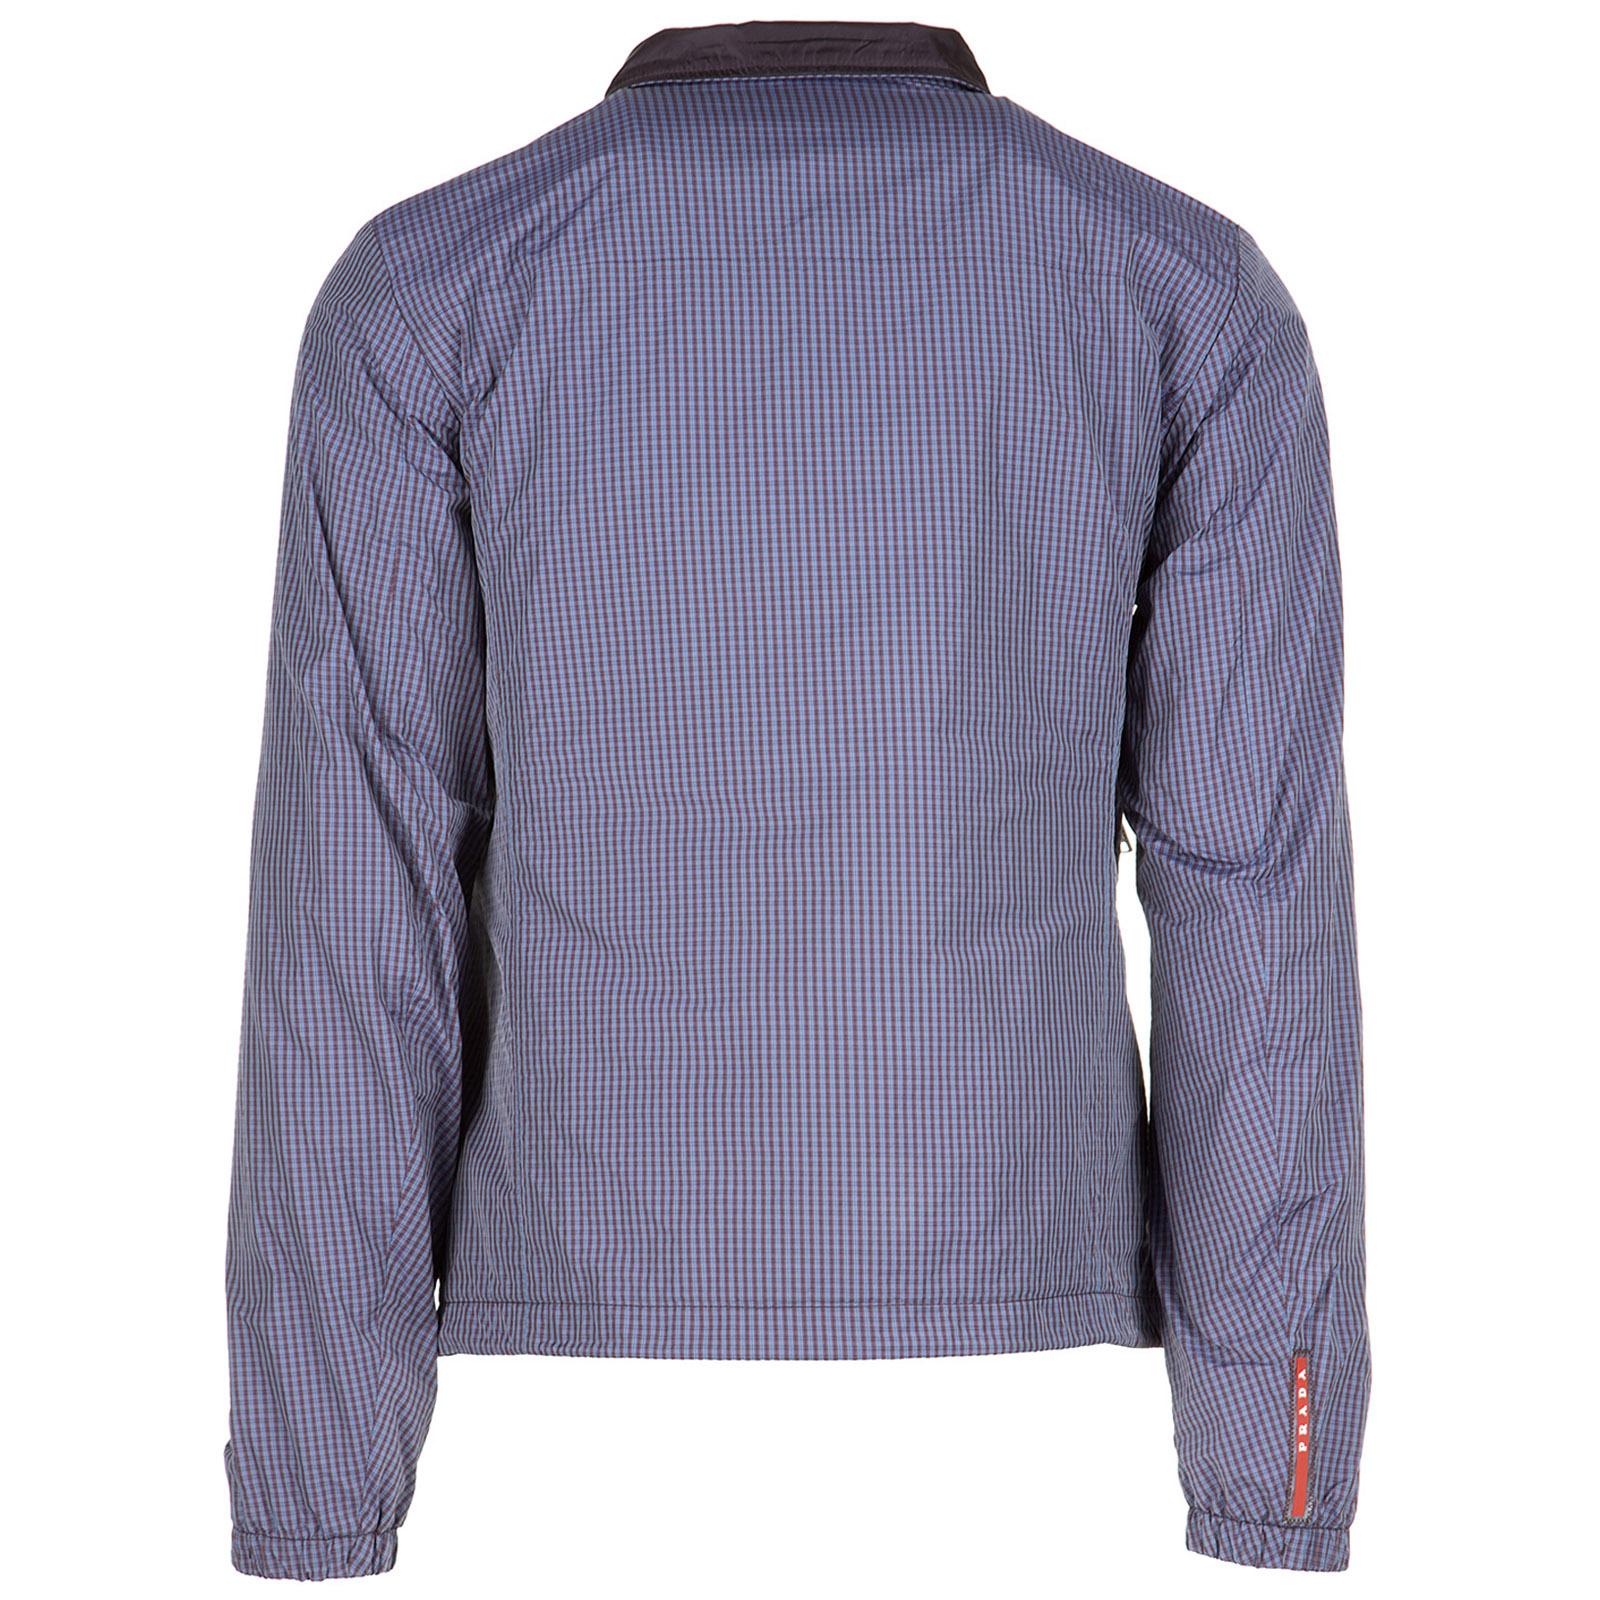 Men's nylon outerwear jacket blouson reversibile